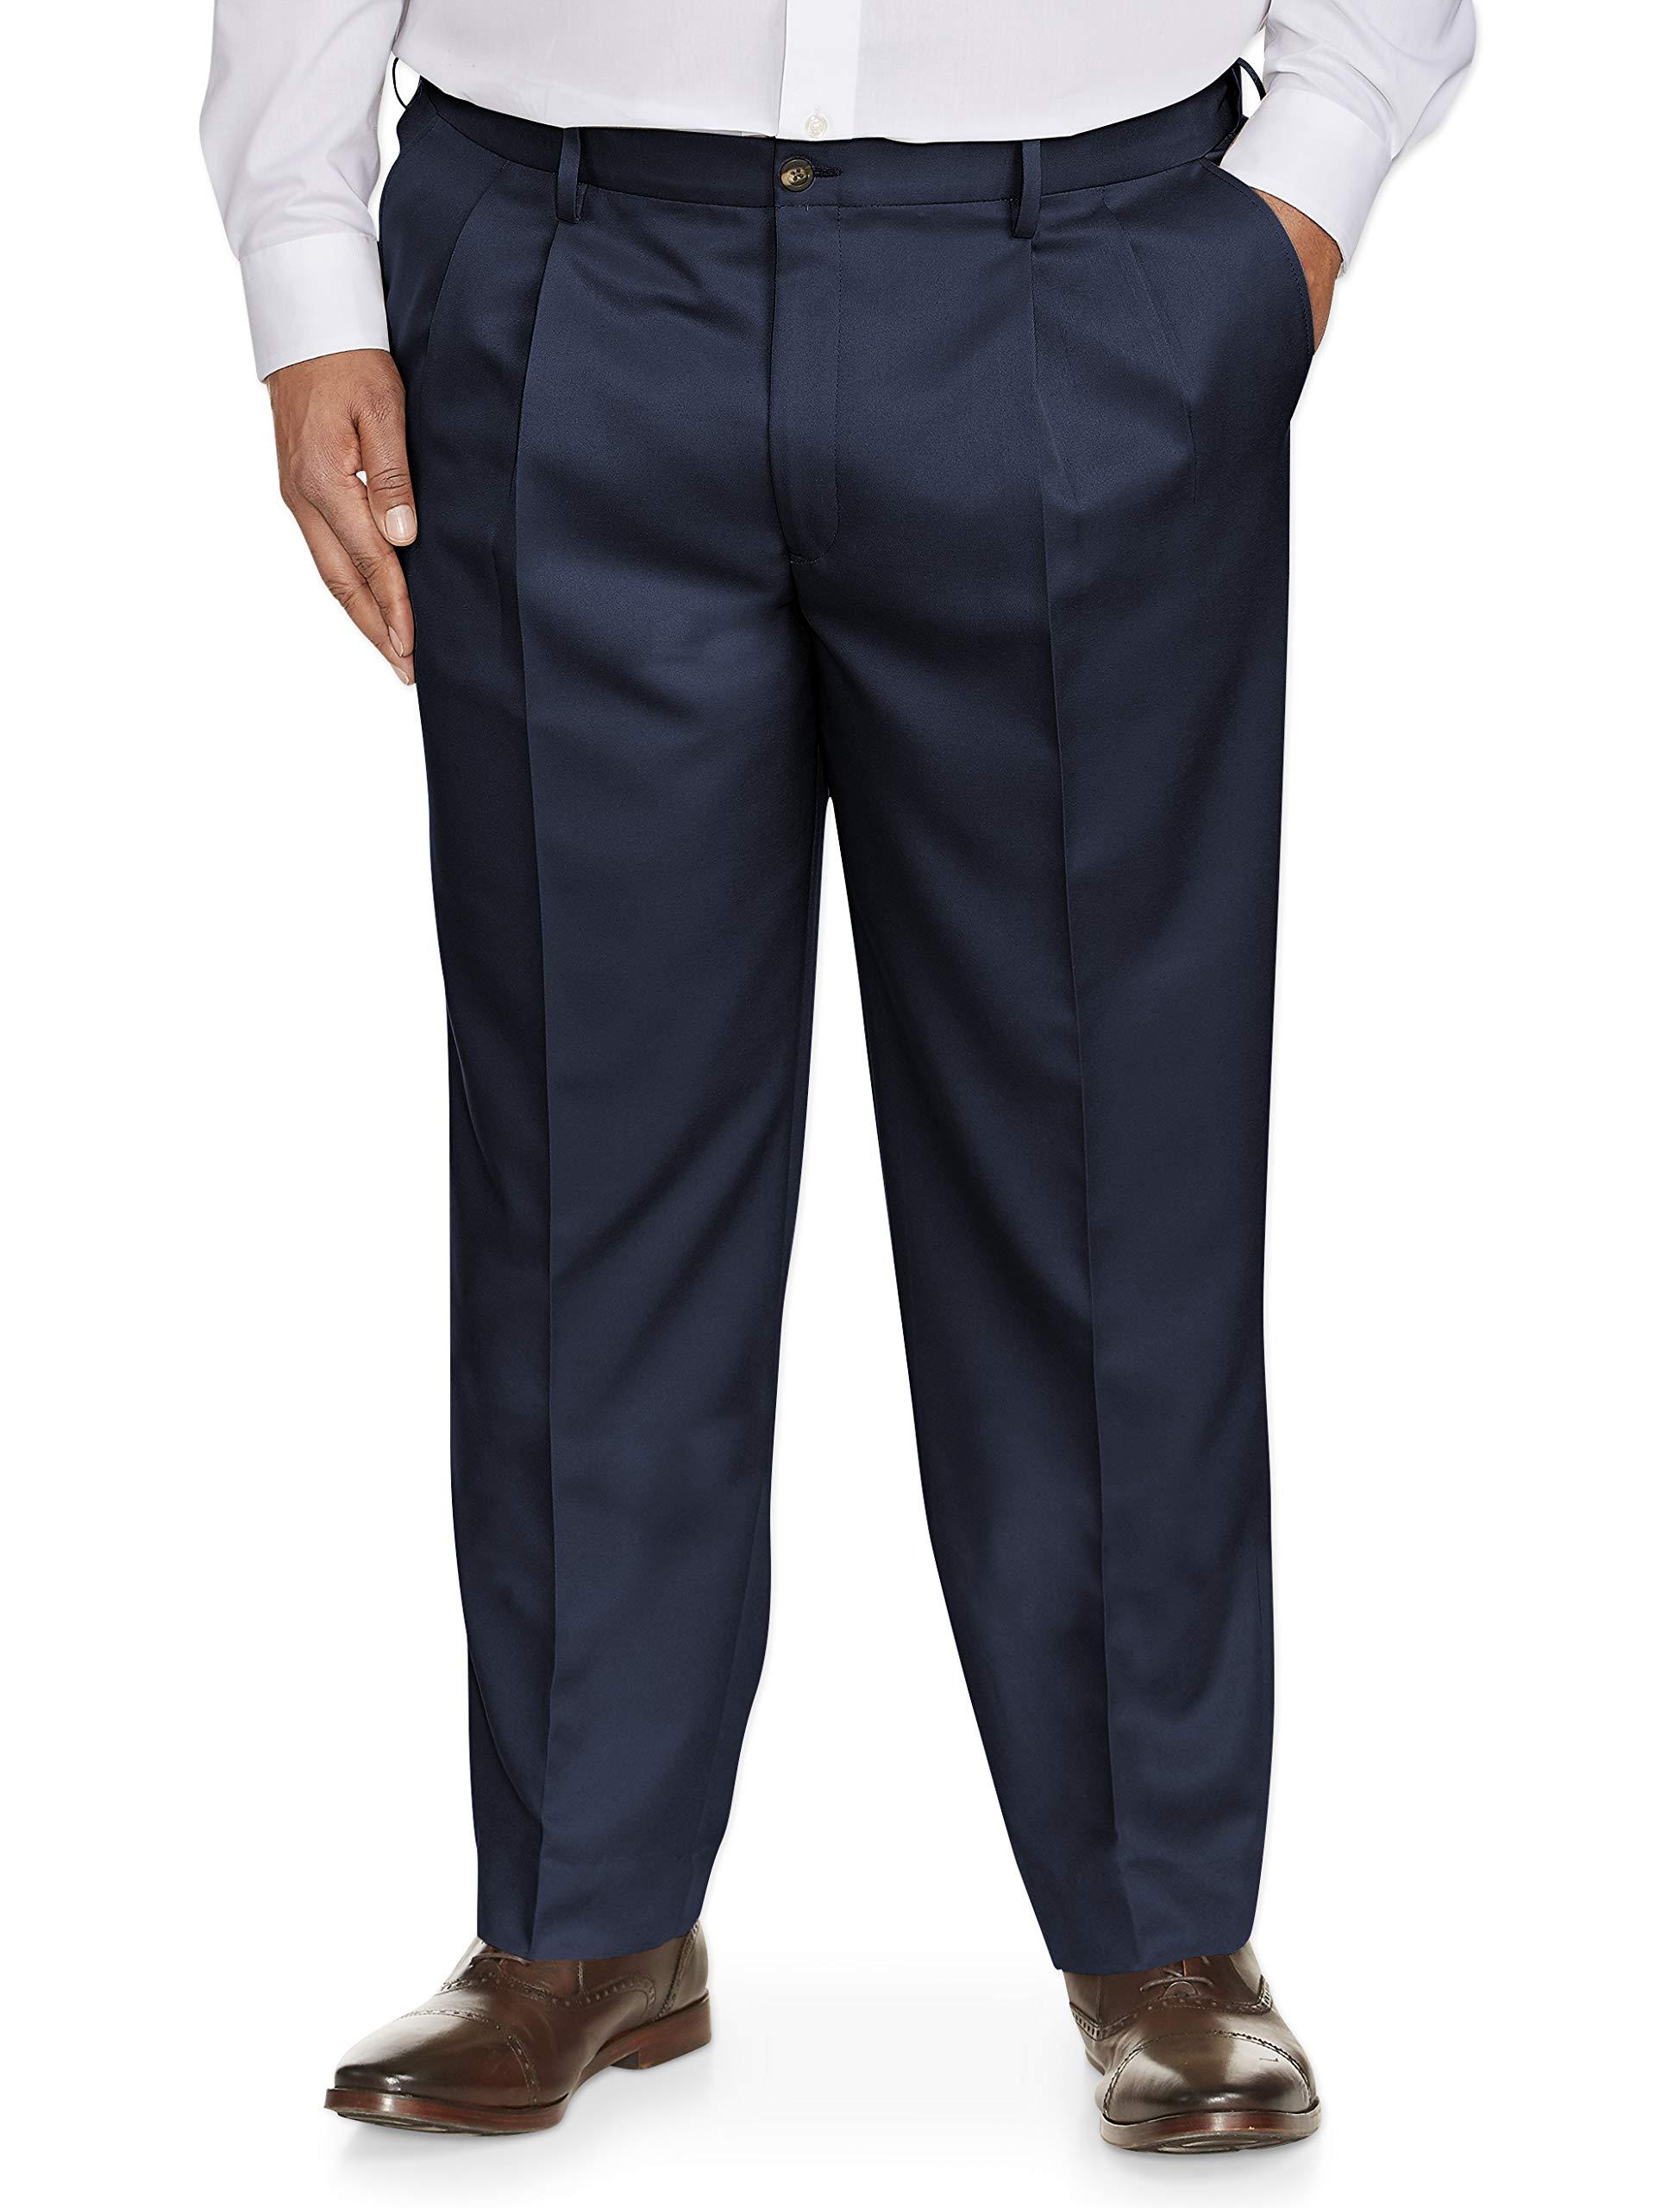 Amazon Essentials Men's Big & Tall Classic-Fit Wrinkle-Resistant Pleated Dress Pant, Navy, 48W x 30L